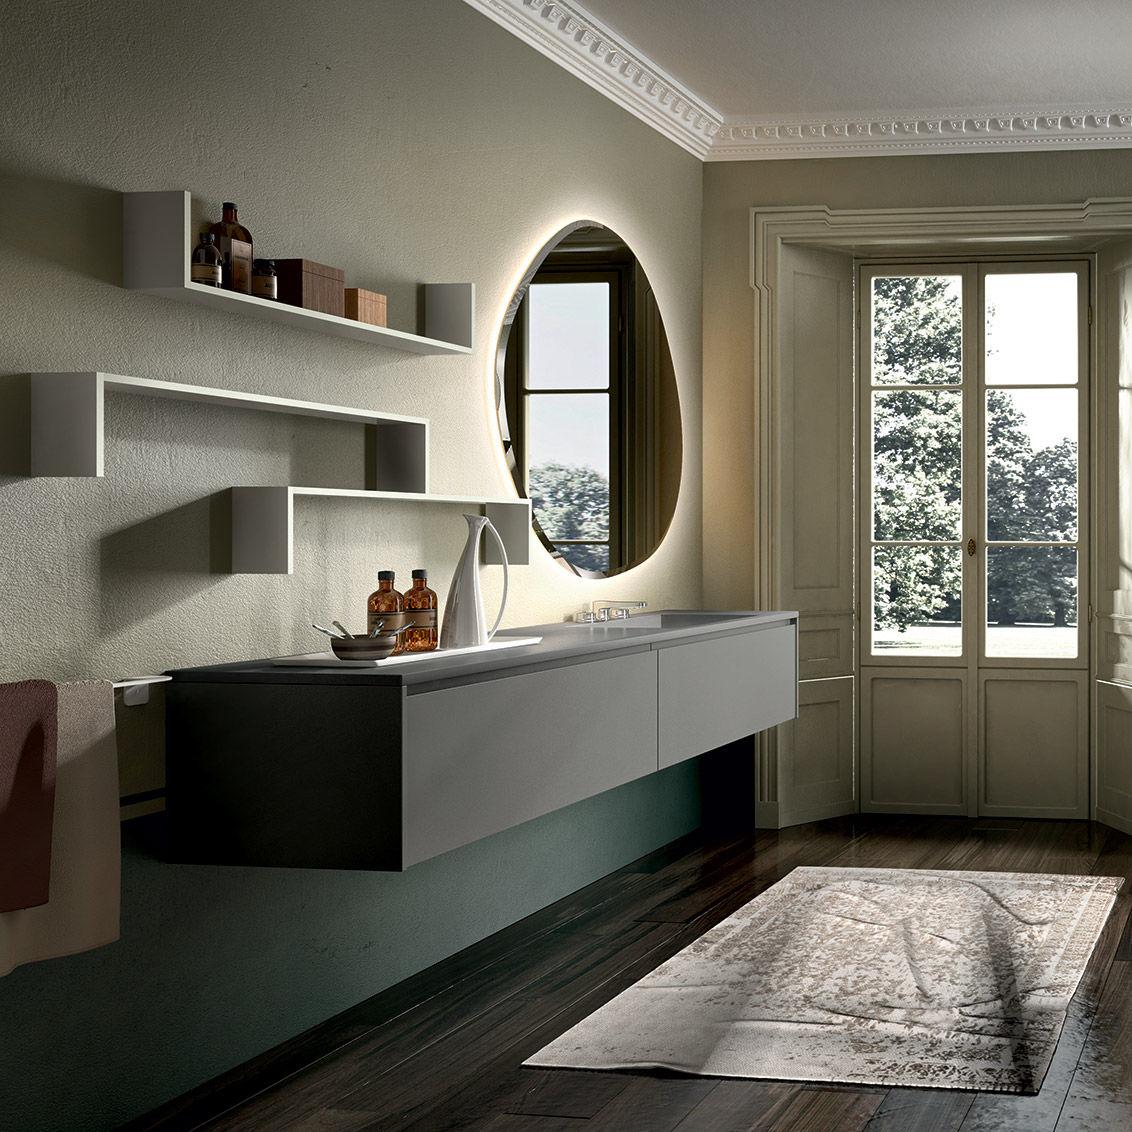 Hängend-Waschtischunterschrank / Holz / modern / mit Ablage - EOS ... | {Waschtischunterschrank modern 37}